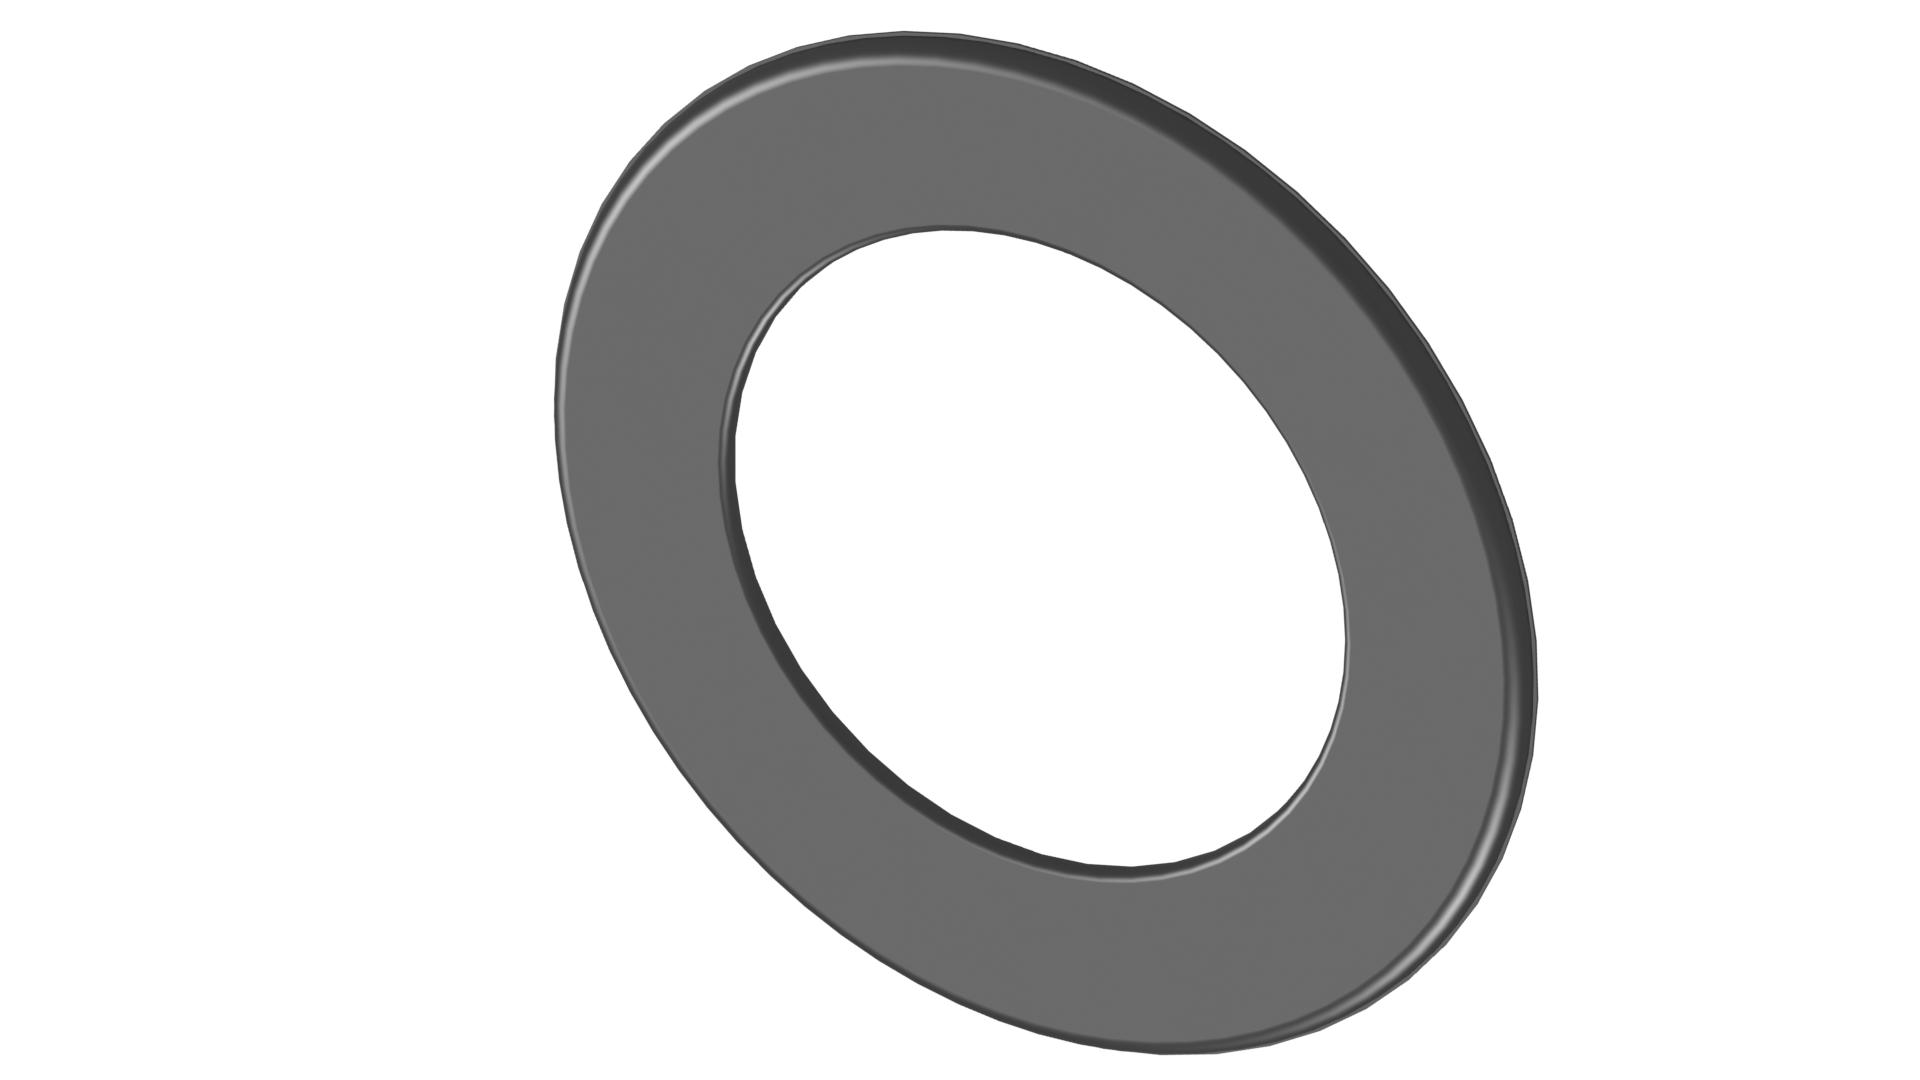 Ofenrohr - Wandrosette 55 mm - schwarz